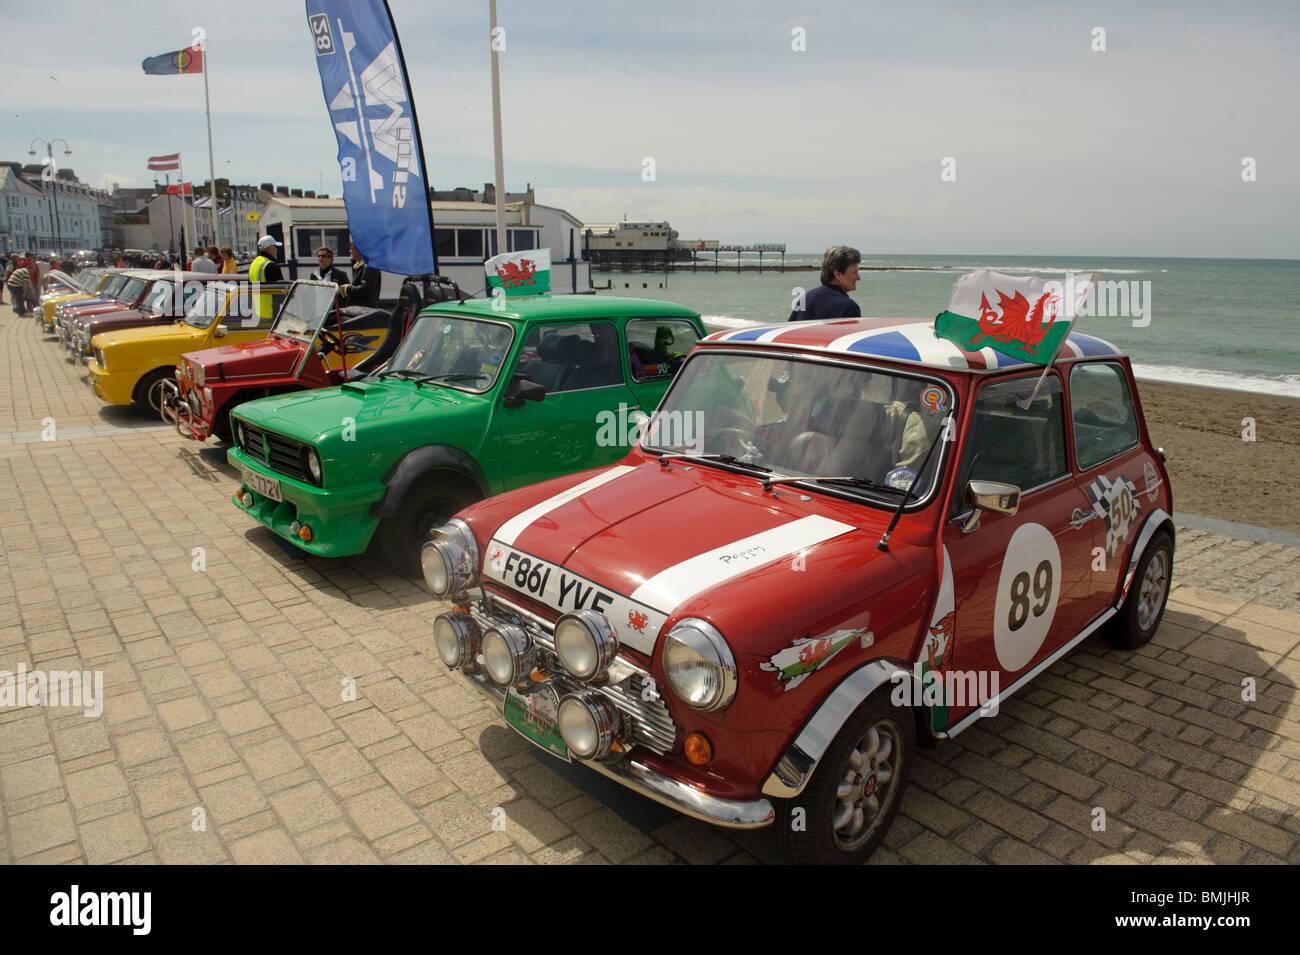 Los propietarios de coches Mini Rally Grupo reunión sobre Aberystwyth paseo marítimo, Gales, Reino Unido Imagen De Stock